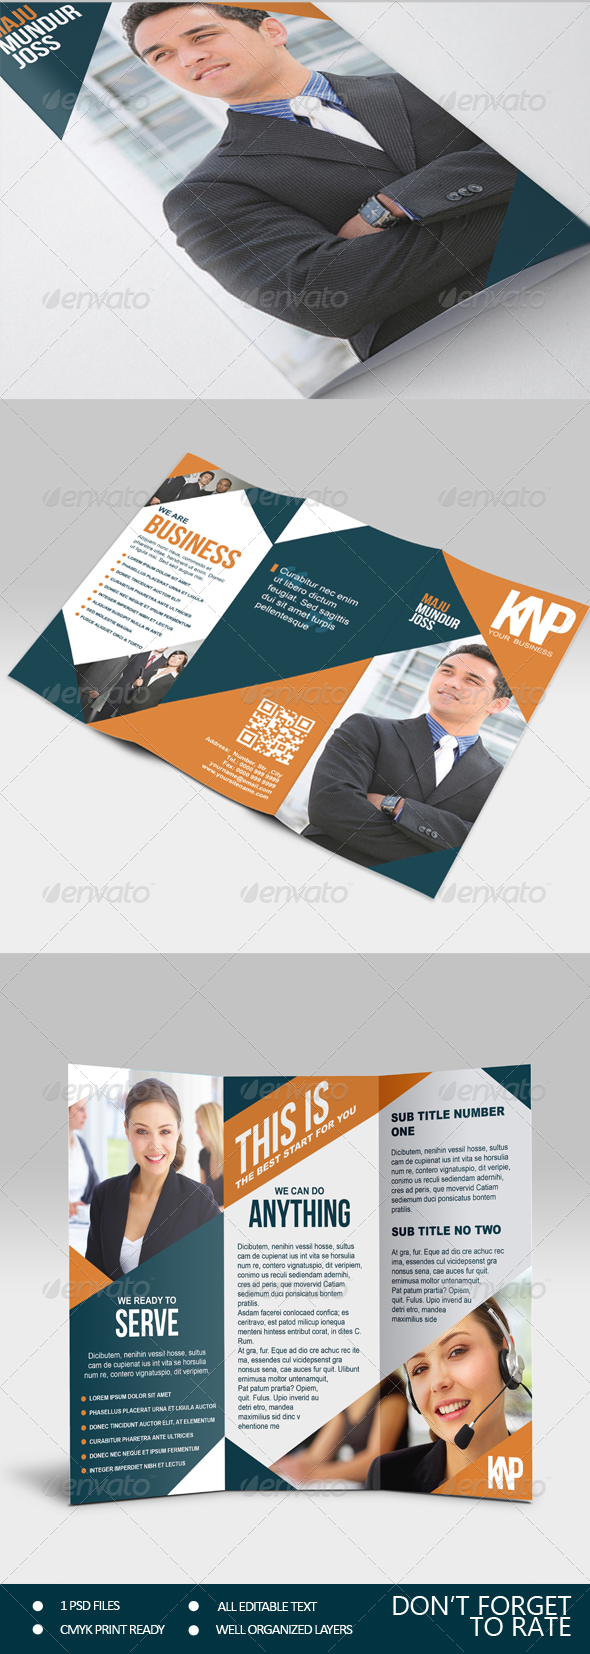 GraphicRiver KNP Multipurpose Trifold Brochure 6951651